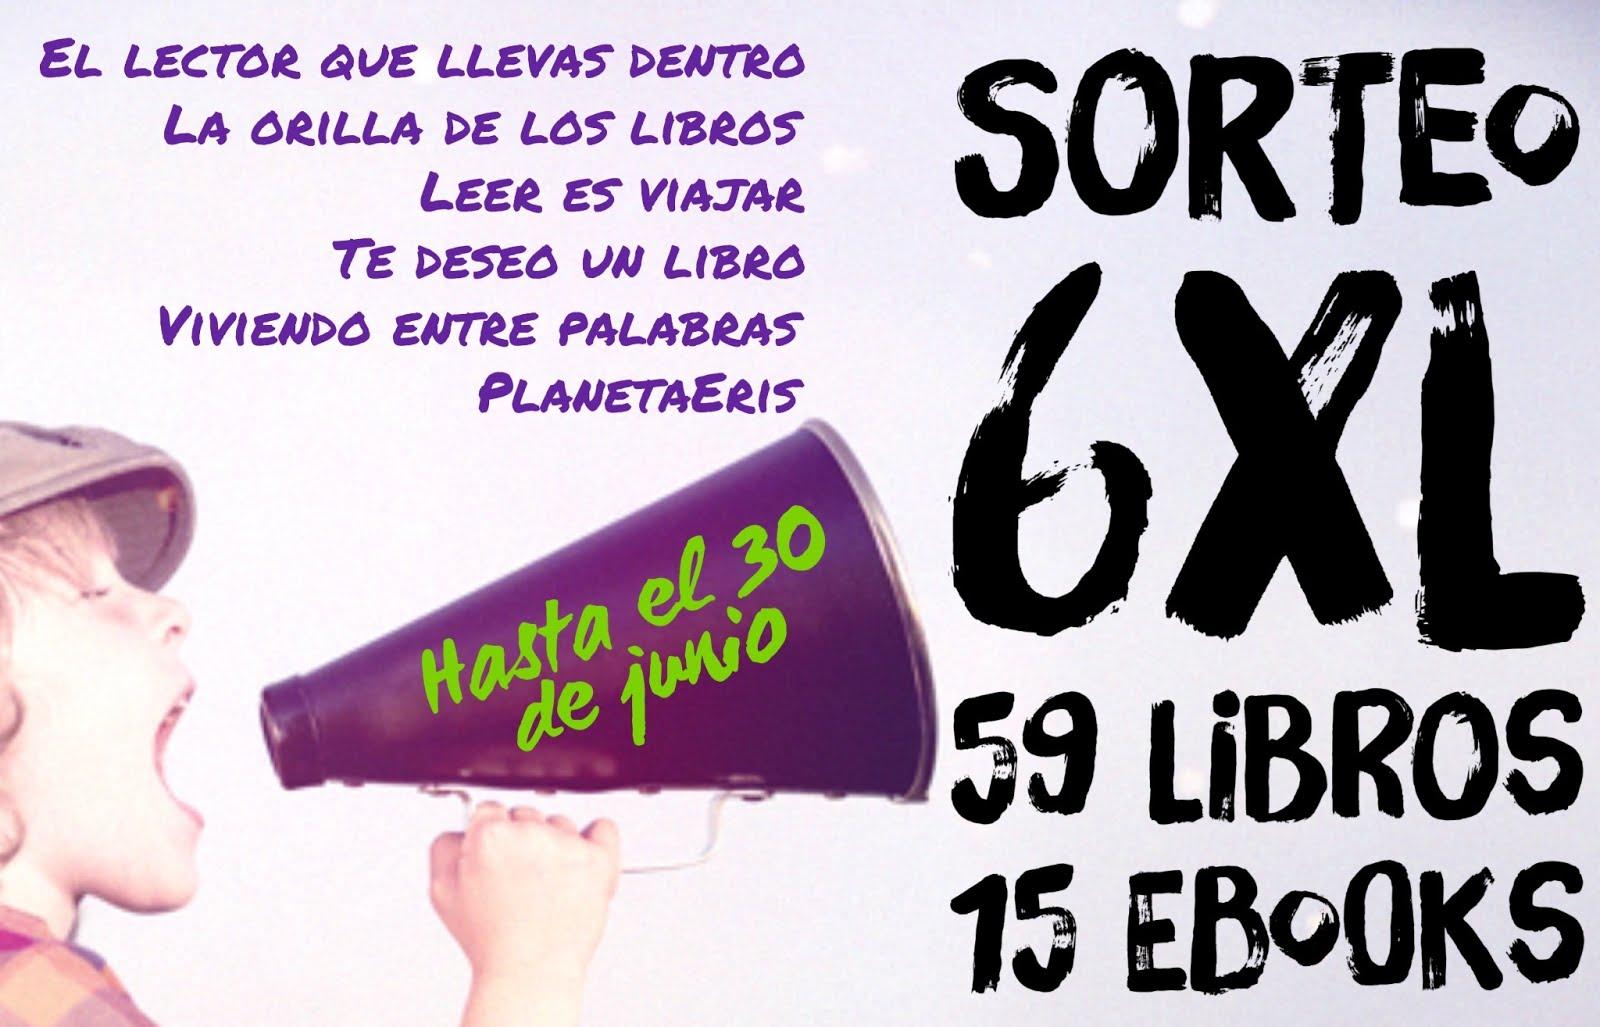 SORTEO 6XL: 59 LIBROS 15 EBOOKS